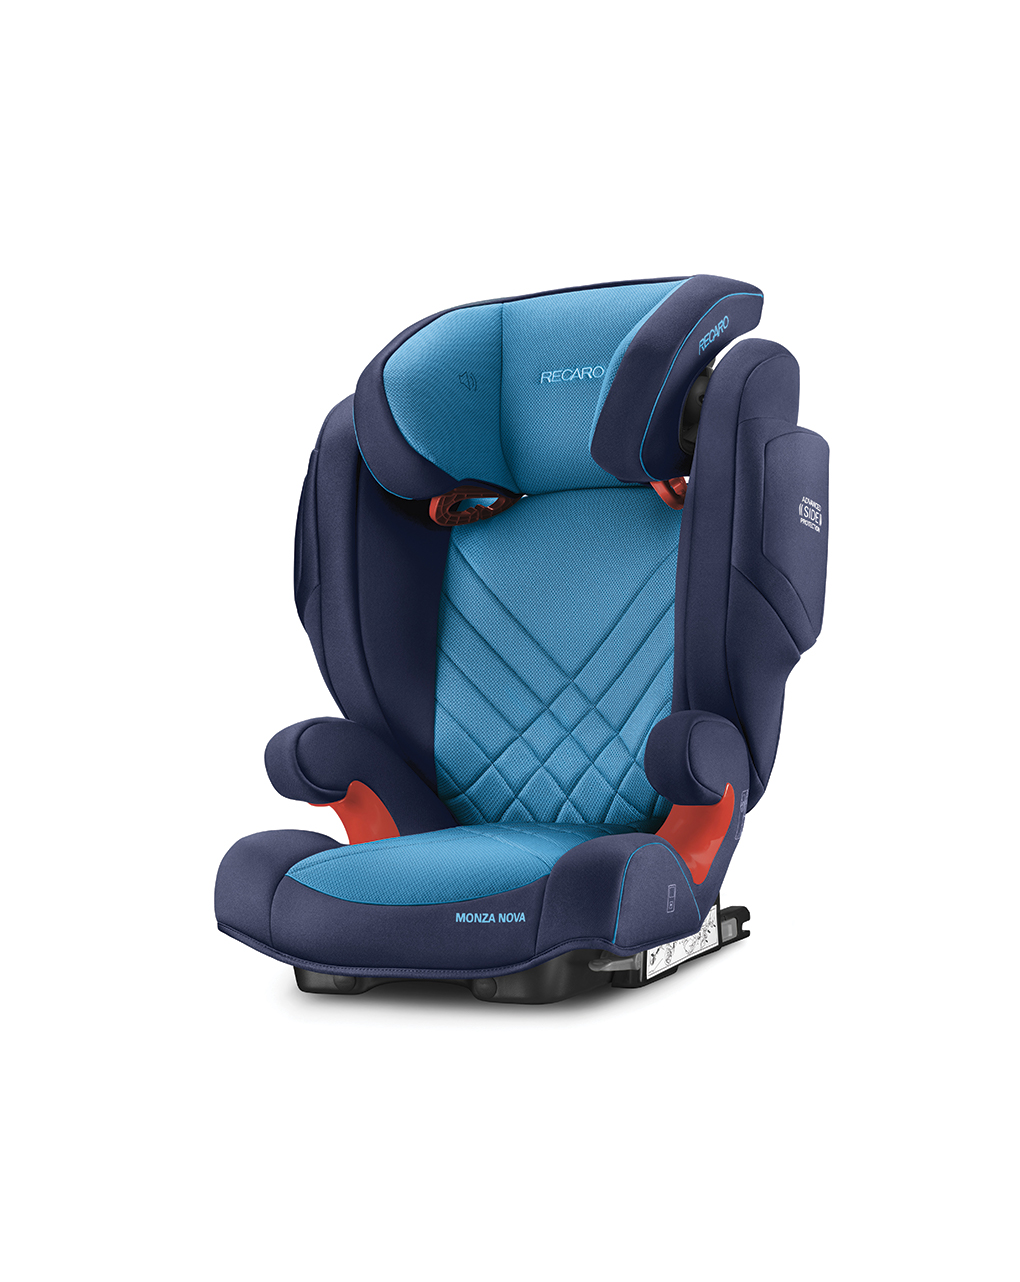 Recaro monza nova 2 seatfix xenon blue (gr. 2/3) - Recaro